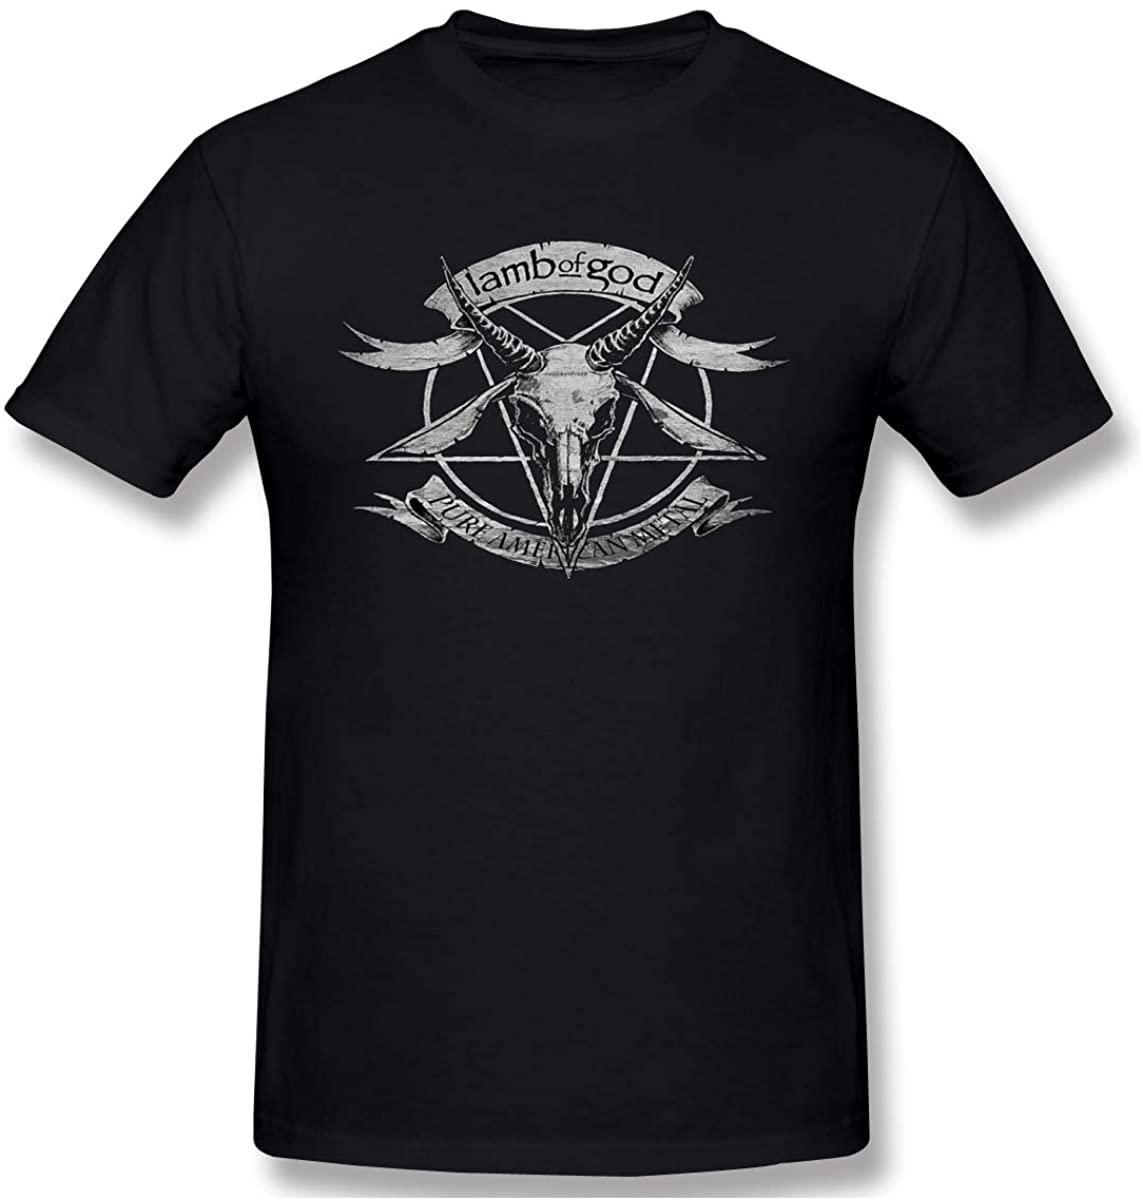 Donmlier Men Shirt Basic Lamb of God Crew Neck Short Sleeves T-Shirts